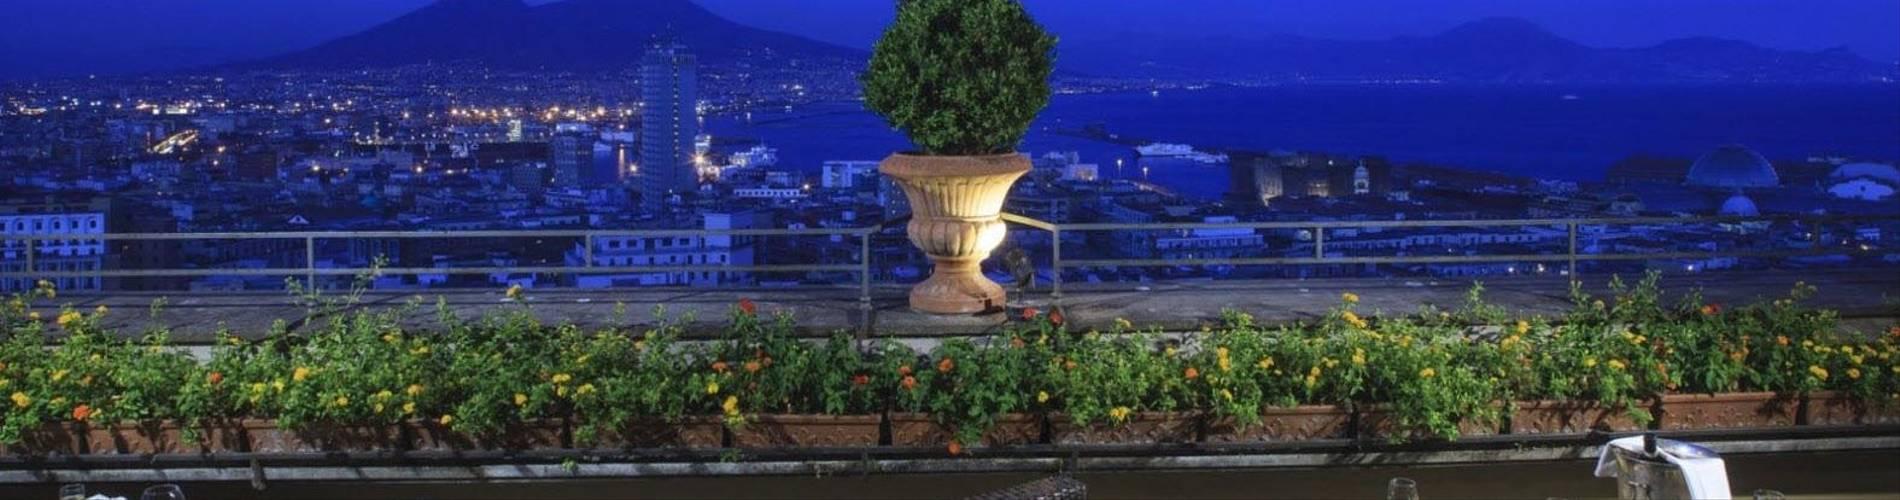 San Francesco Al Monte, Naples, Italy (15).jpg